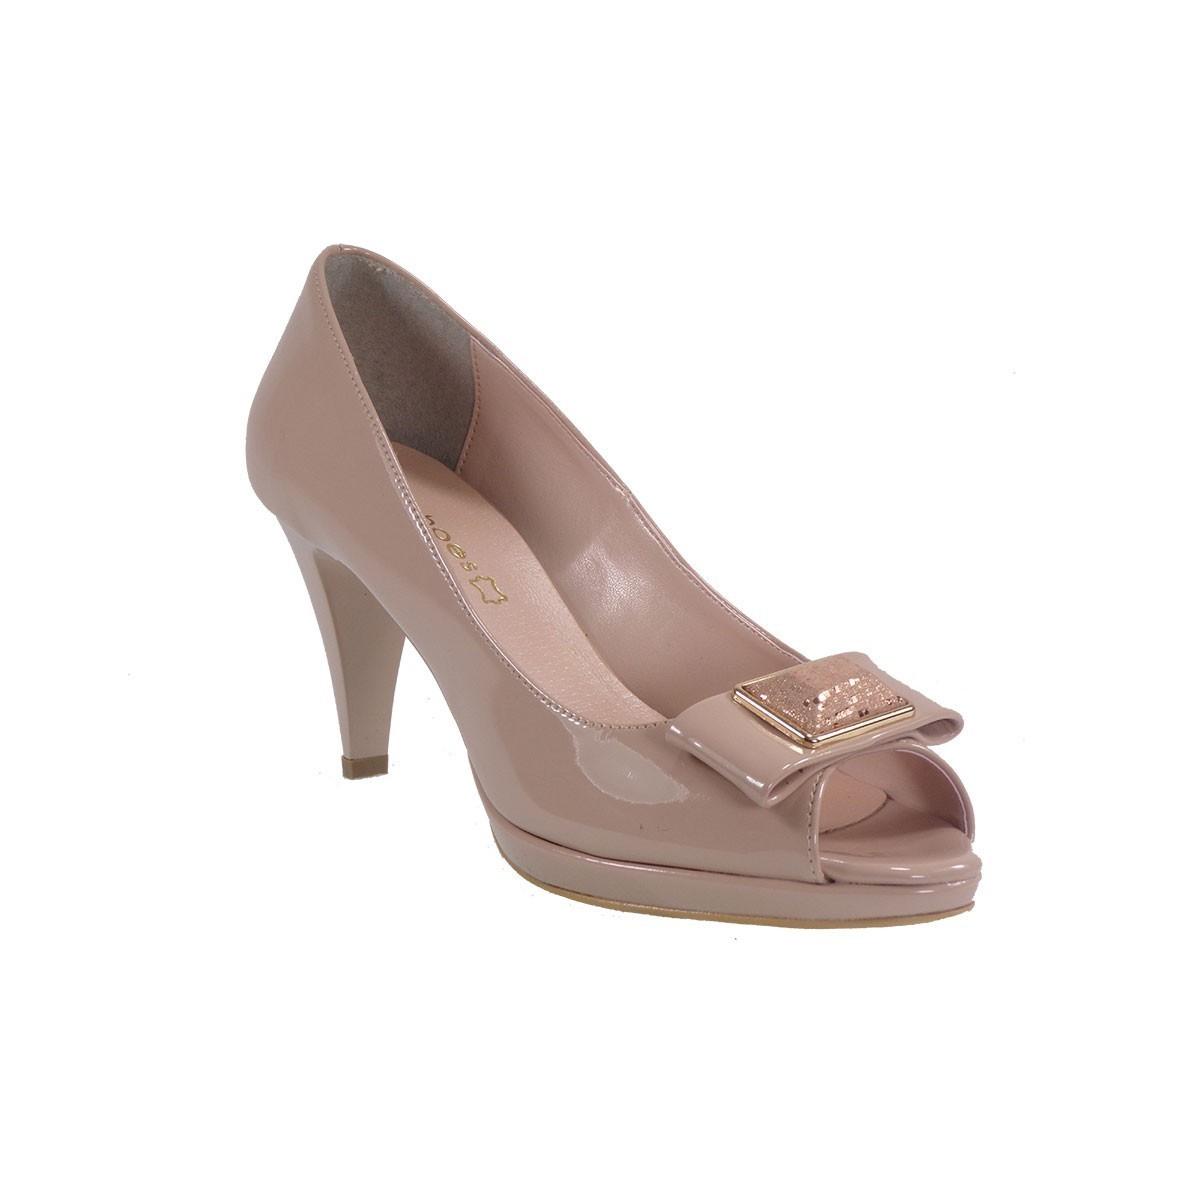 b841ea42762 Katia Shoes Γυναικεία Παπούτσια Γόβες 79-69 Νude Λουστρίνι |Γυναικεία &  Ανδρικά Παπούτσια - BagiotaShoes.gr